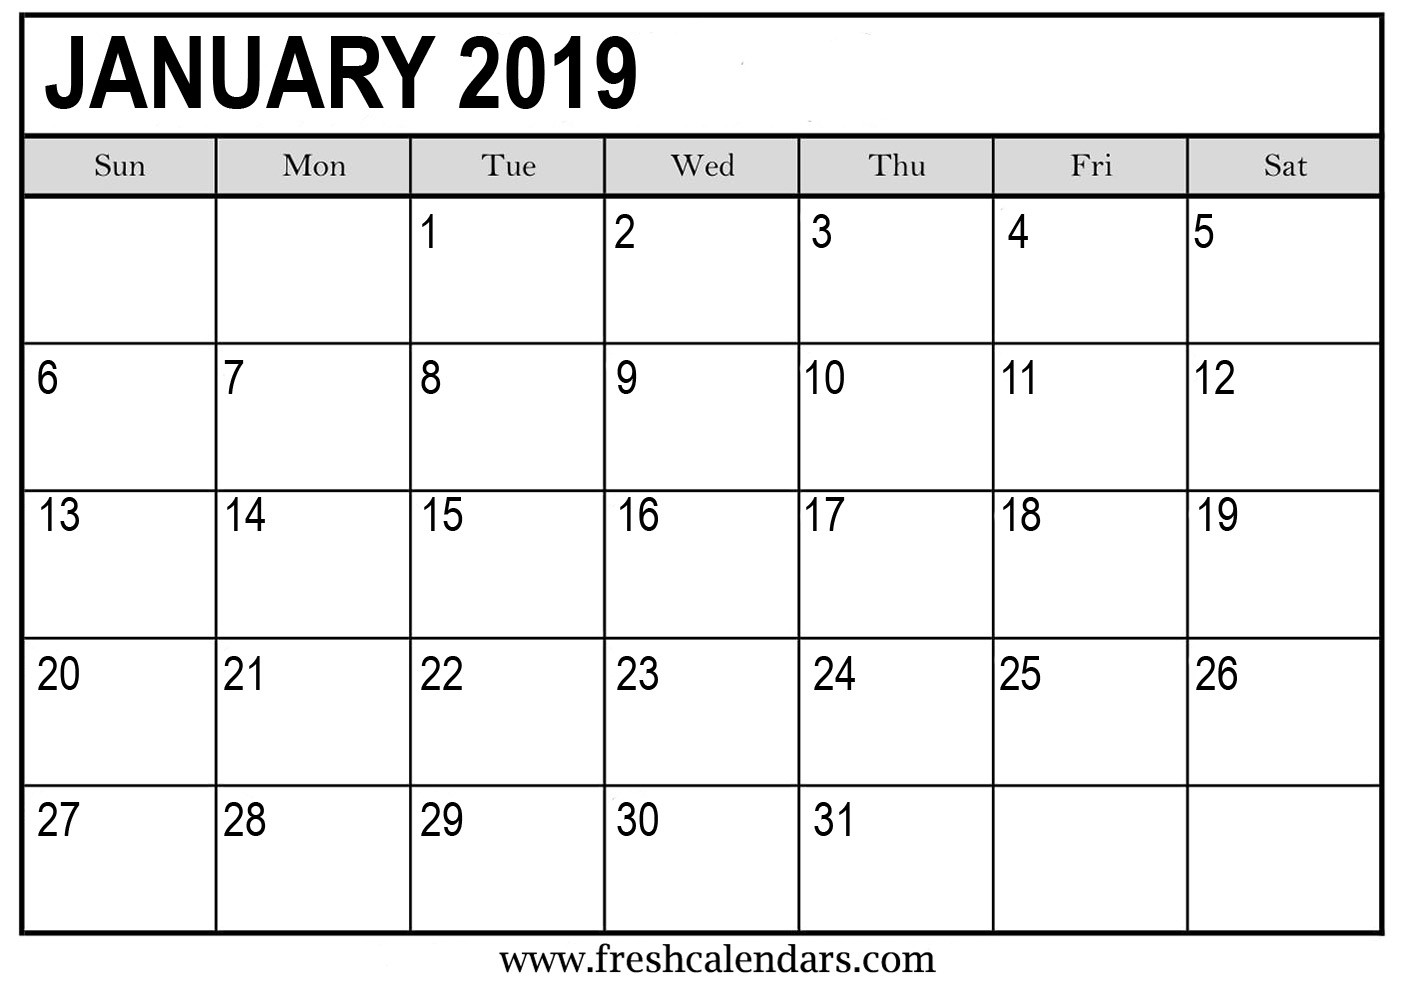 Printable Monthly Calendar Templates January 2019 Calendar Printable Fresh Calendars